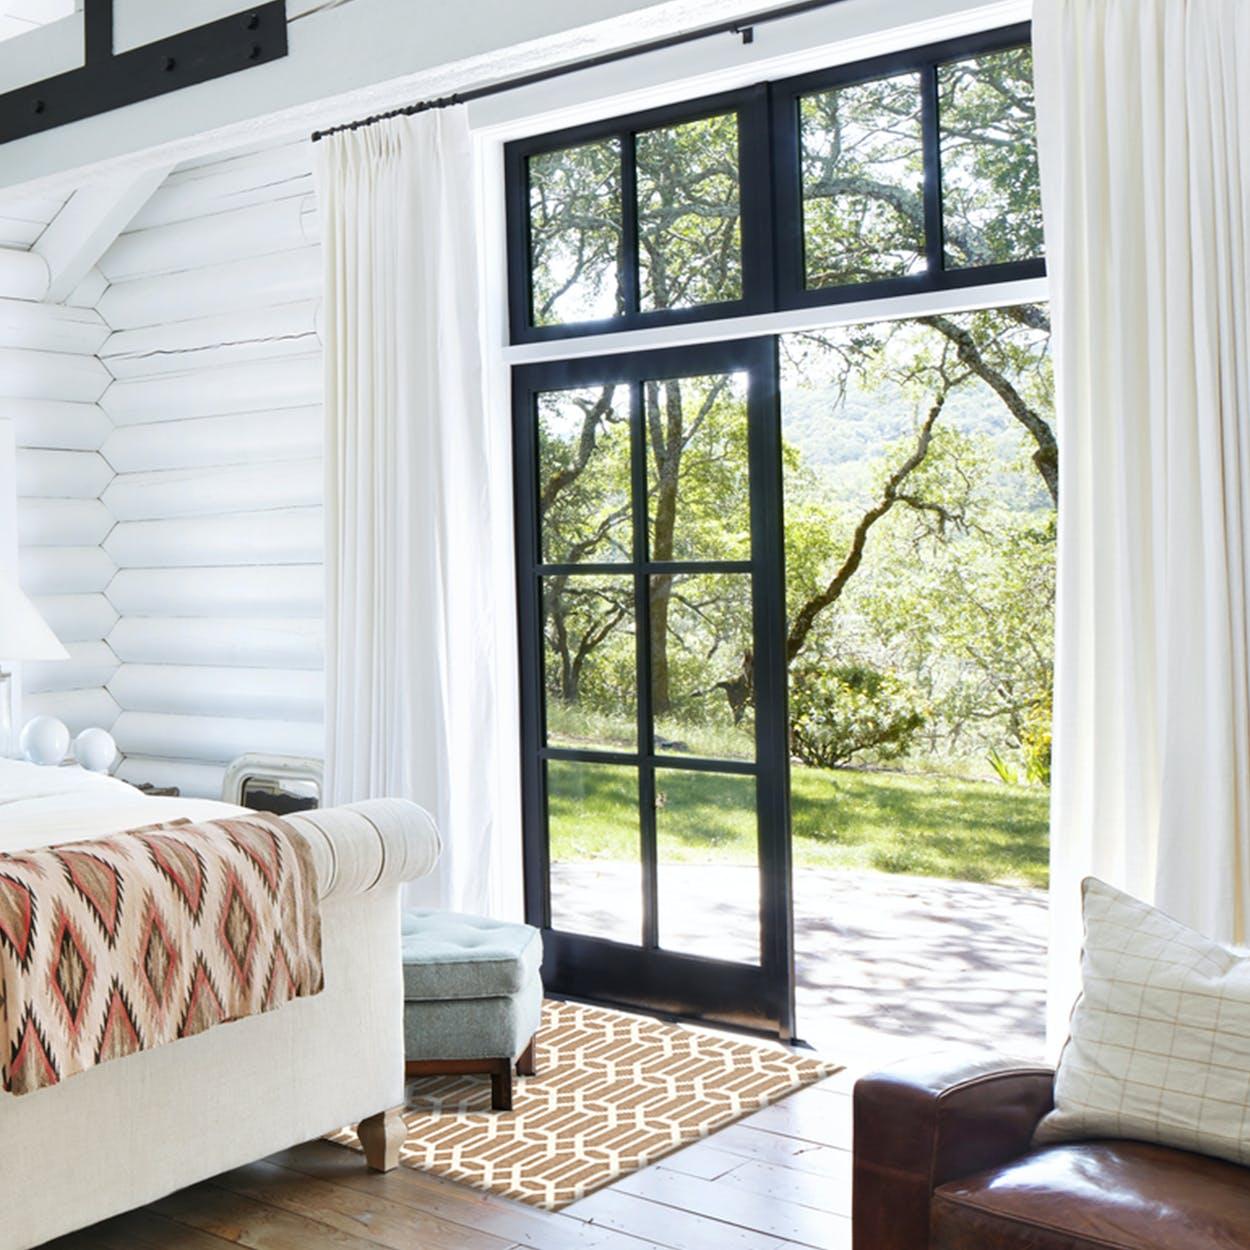 Modern Fretwork Rug in Rich Tan & White